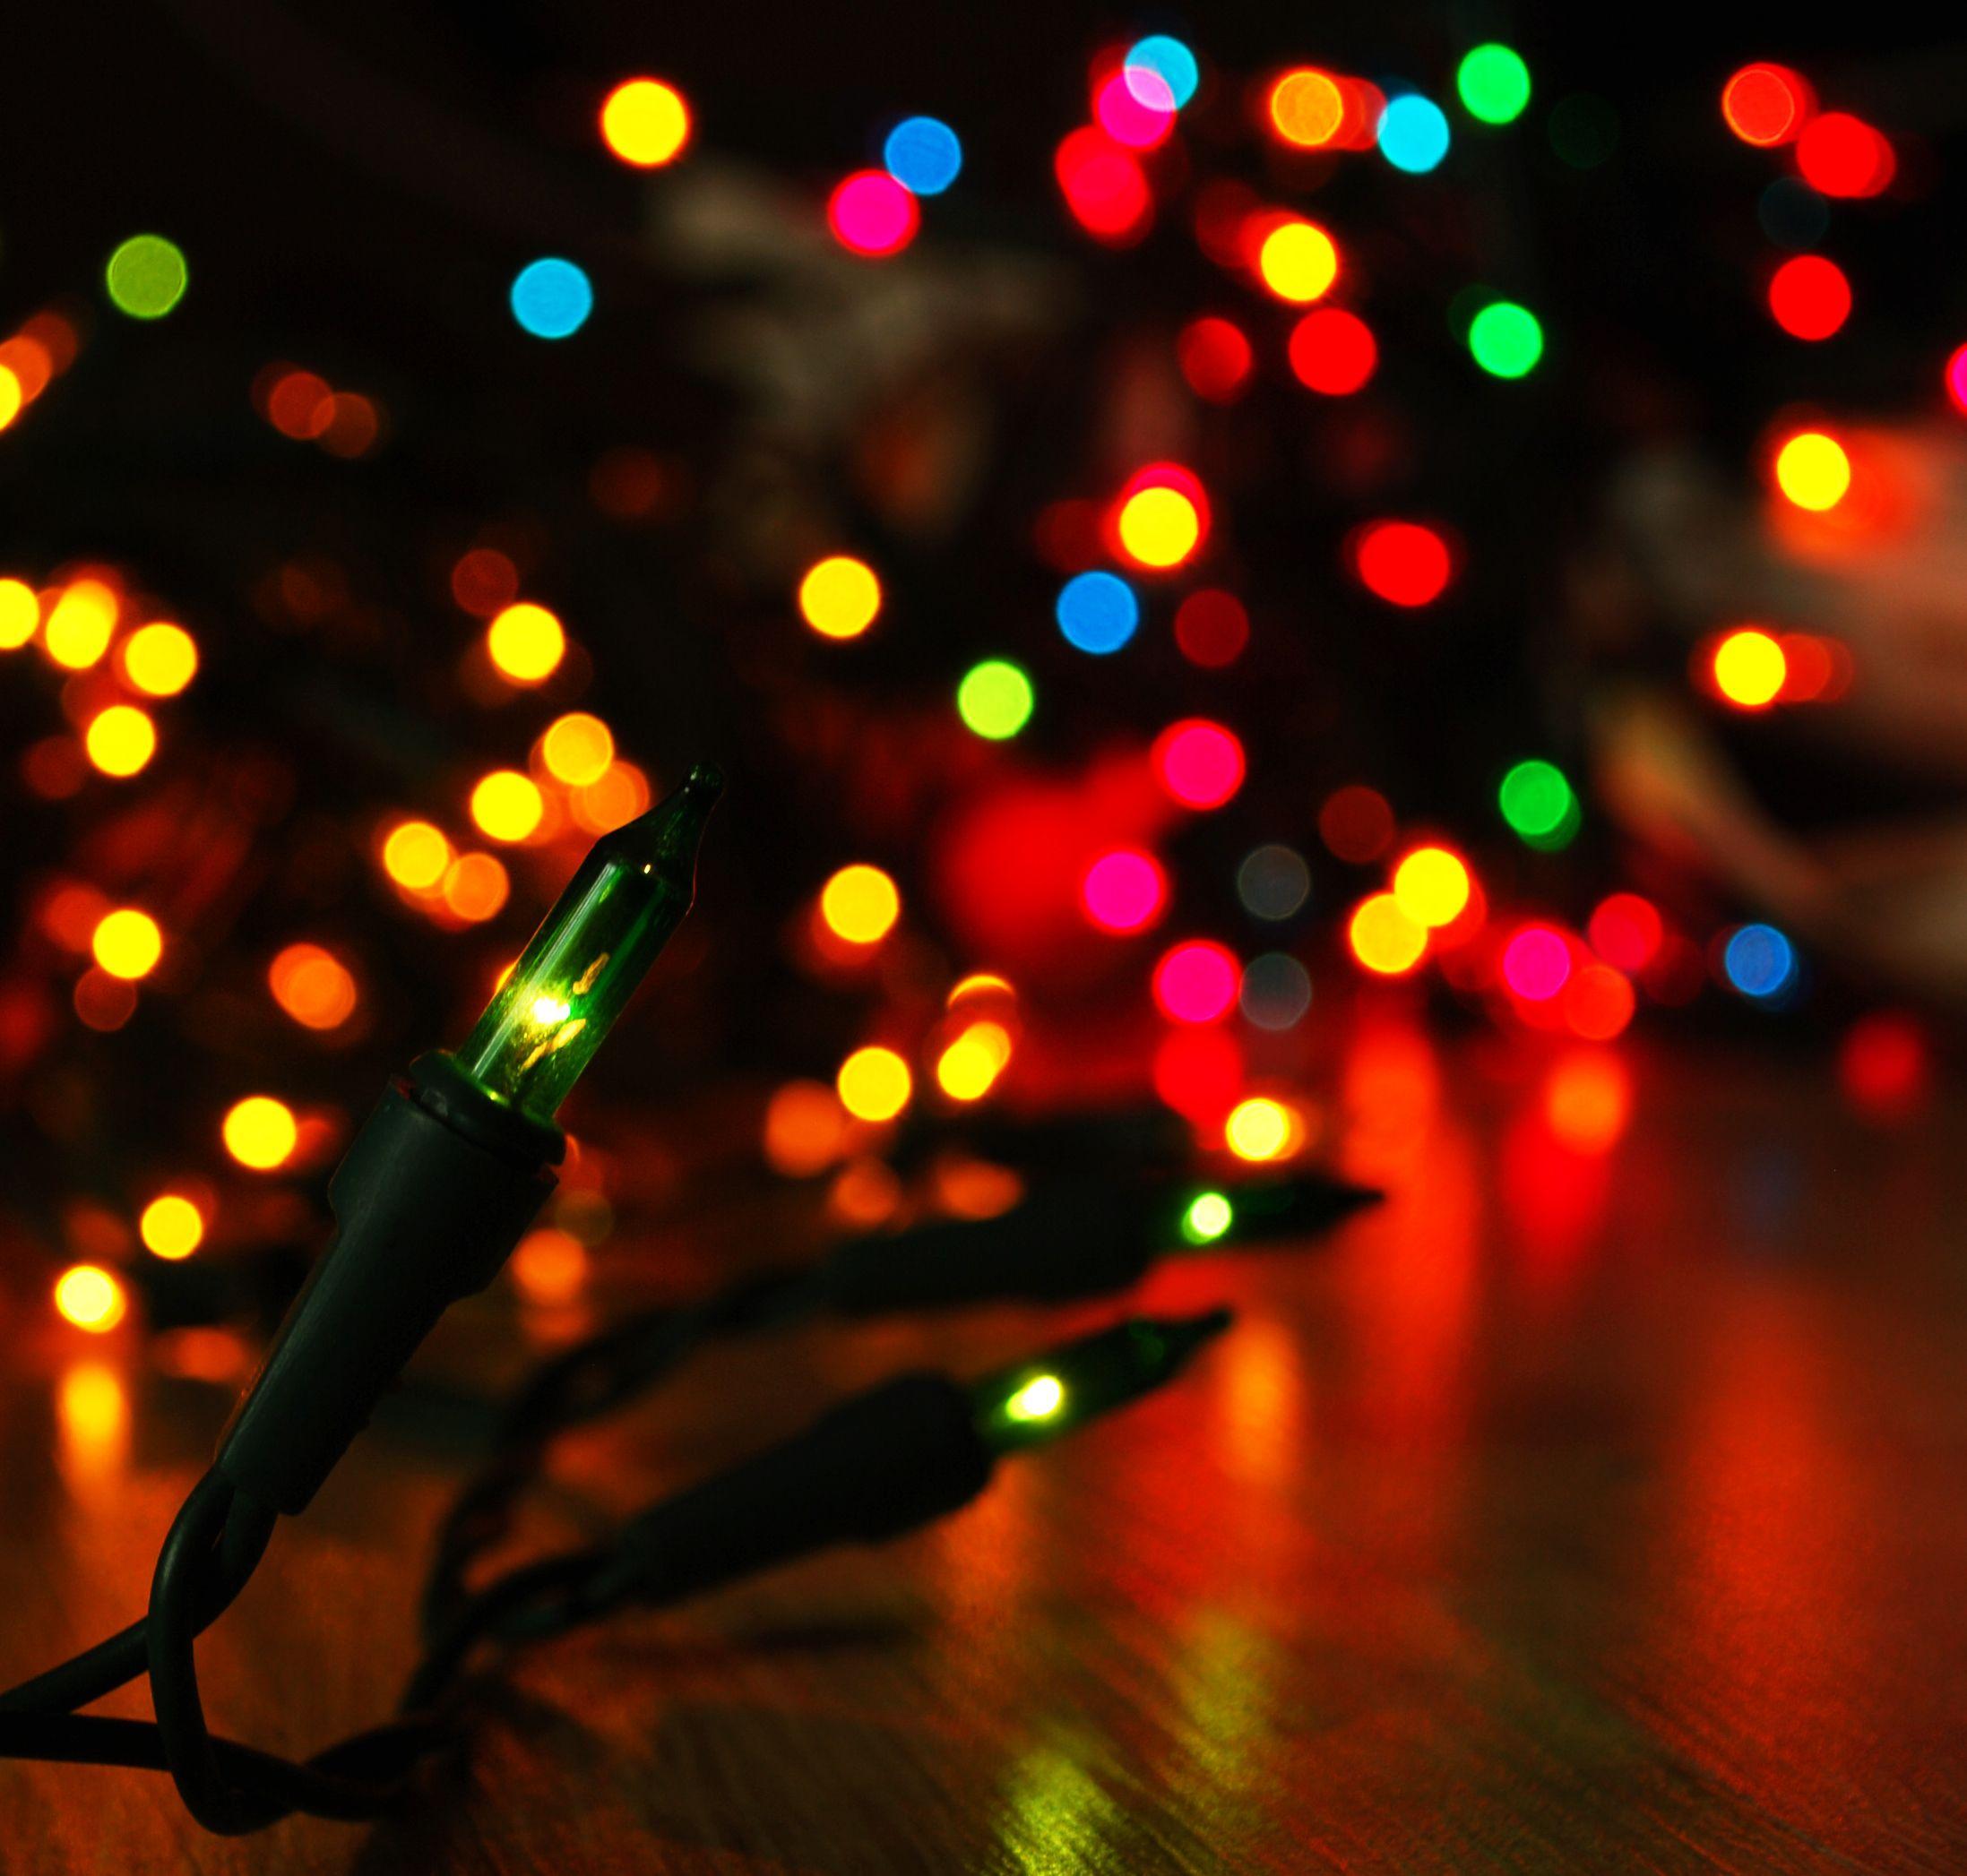 Xmas Lights Wallpapers Desktop In 2020 Wallpaper Iphone Christmas Christmas Wallpapers Tumblr Christmas Lights Wallpaper